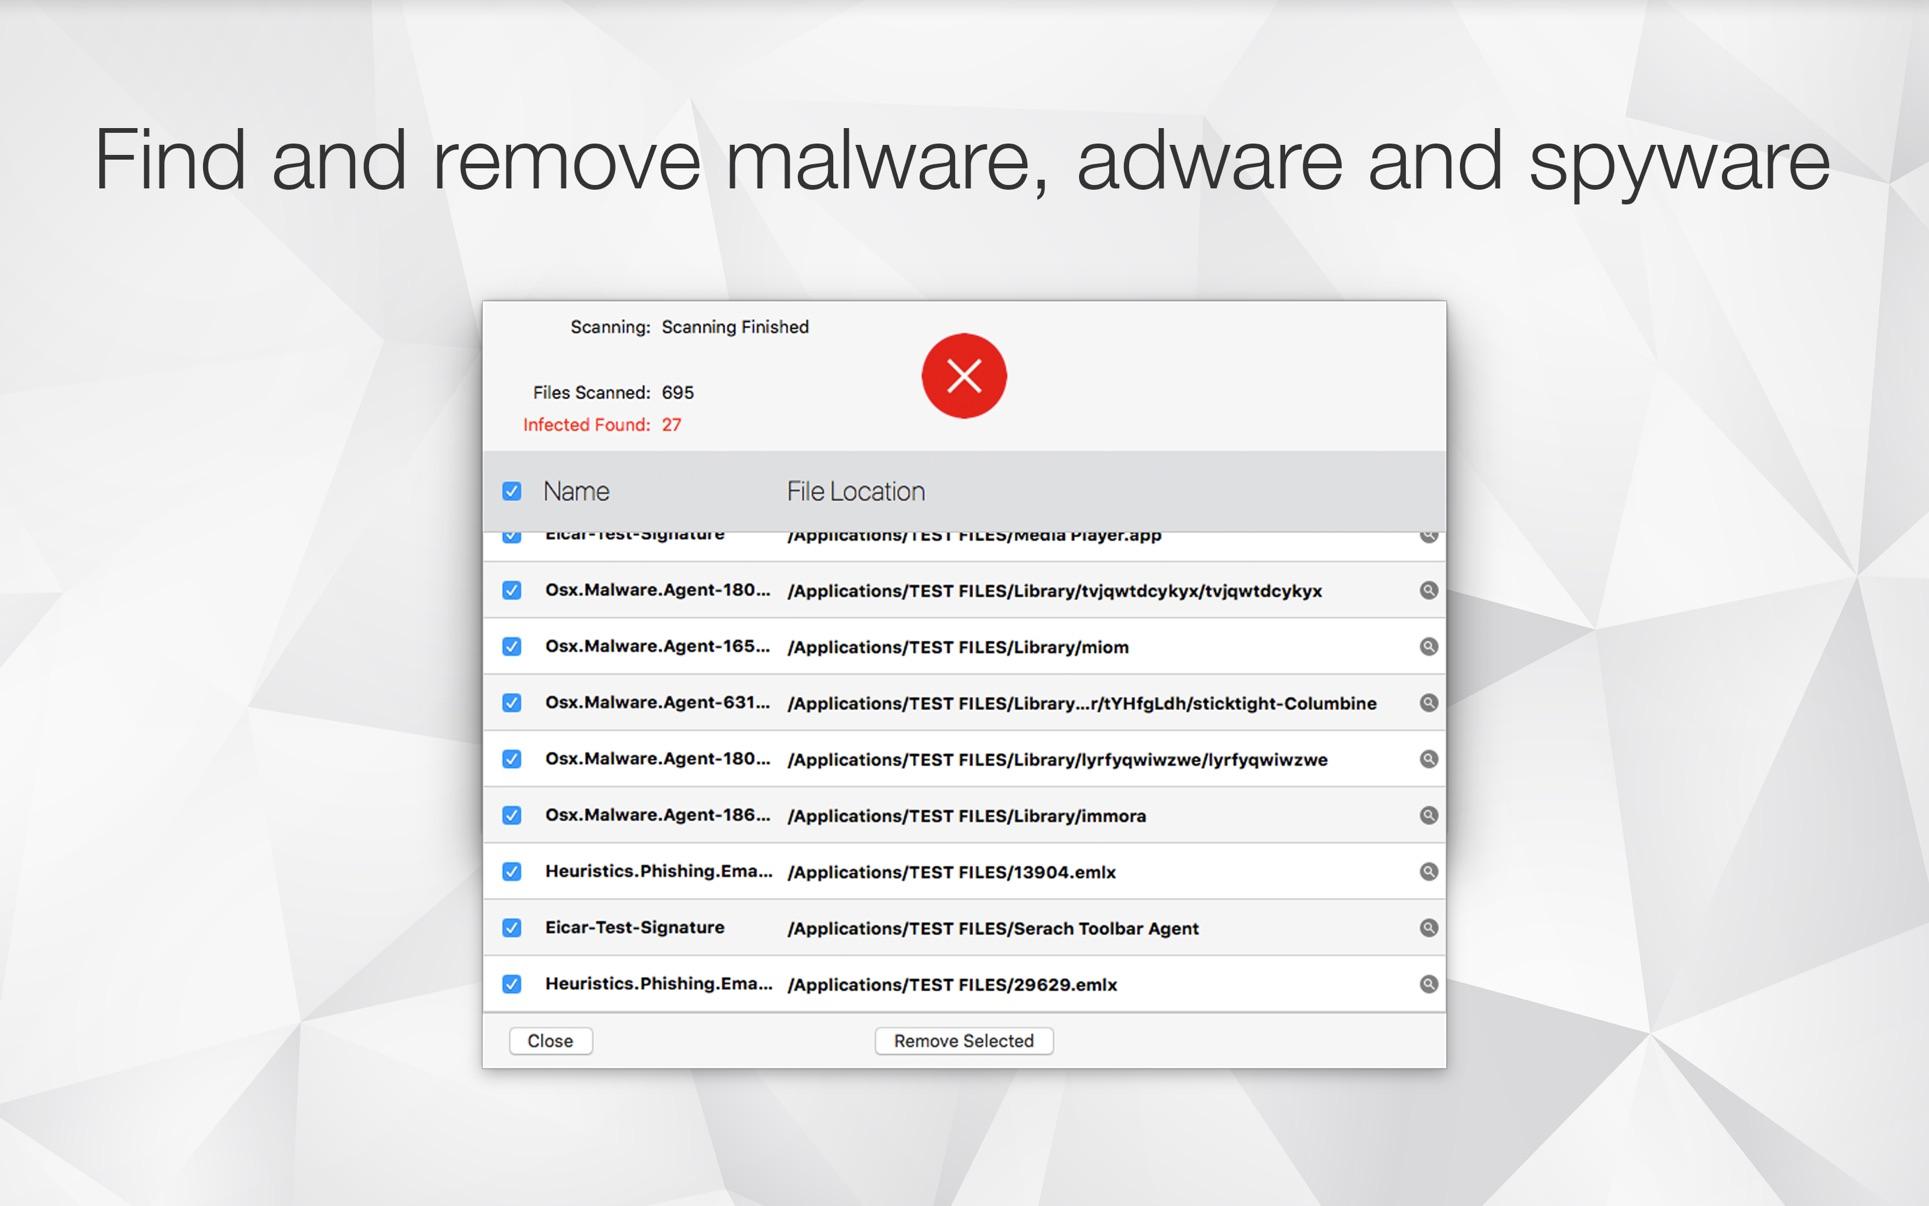 Antivirus Zap Virus Adware 3.10.2.1 Mac 破解版 系统安全全面解决方案